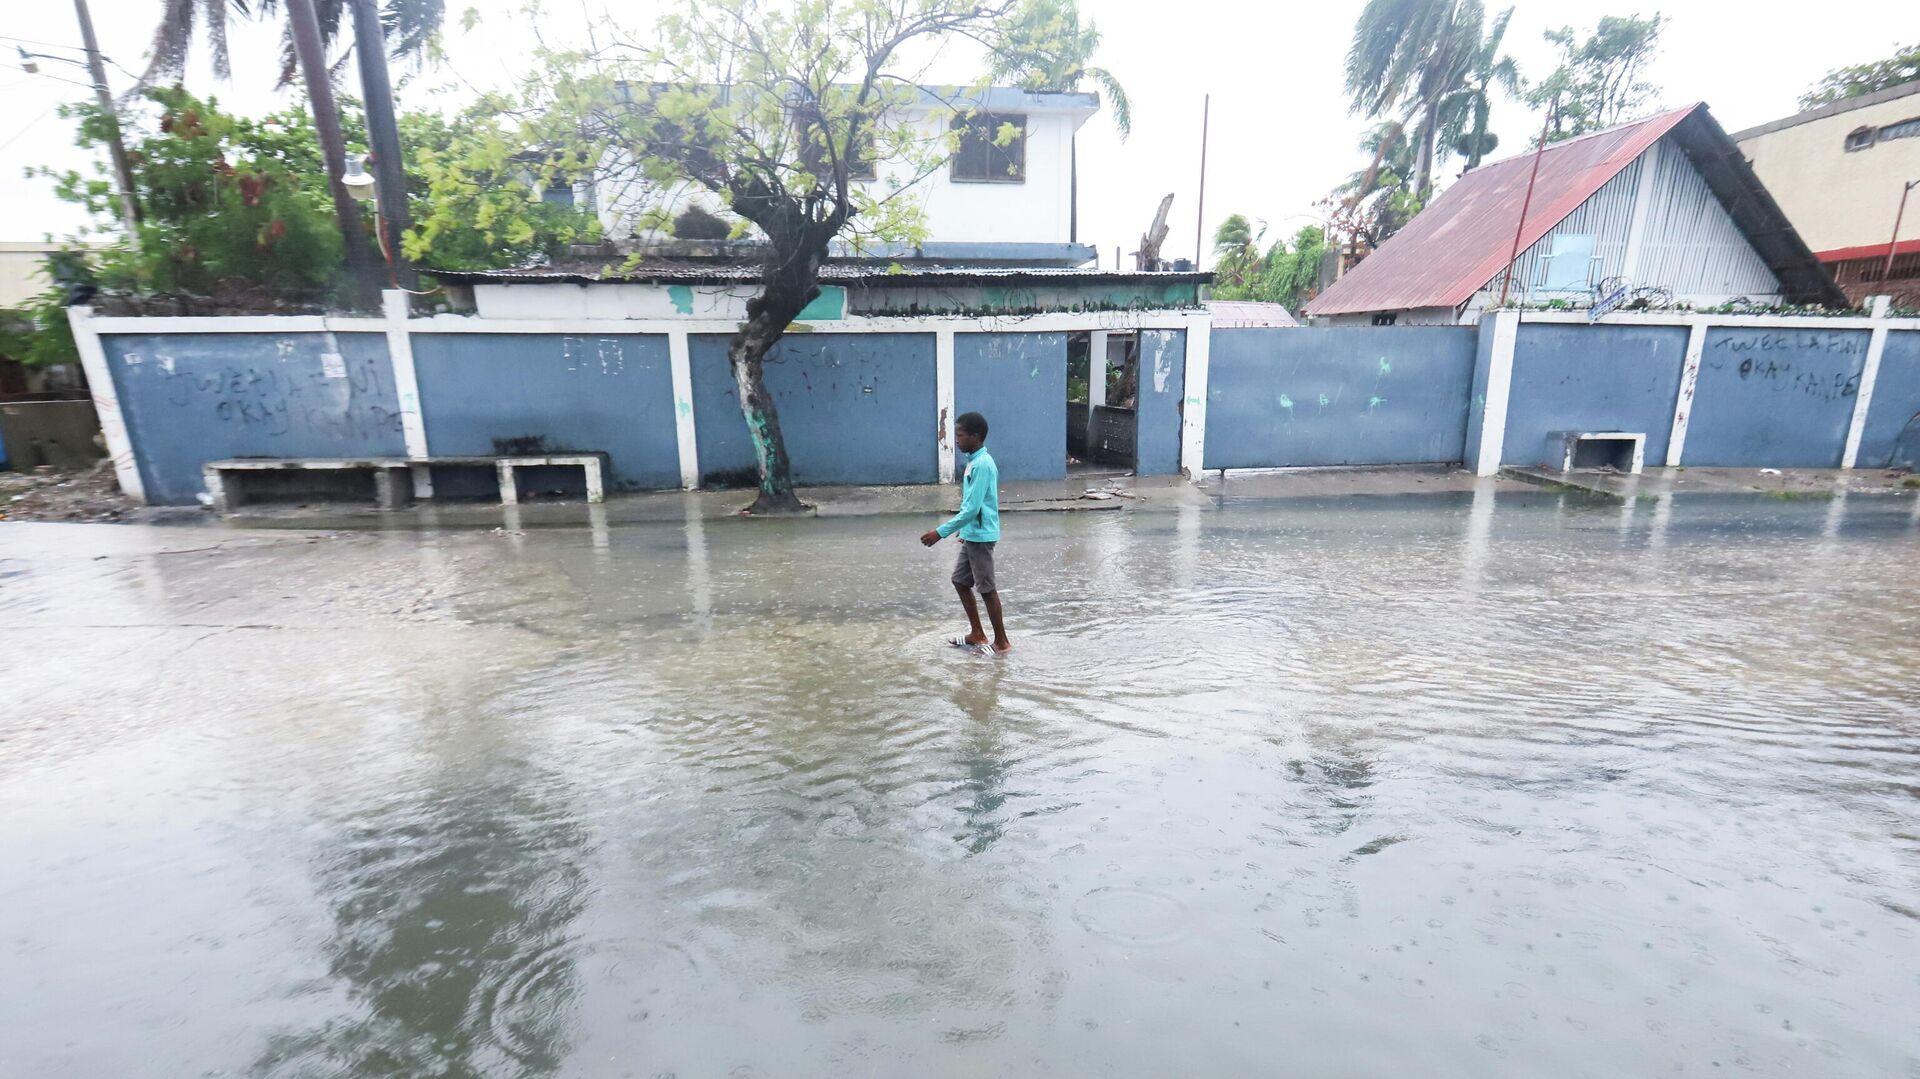 Tormenta tropical Grace en Haití - Sputnik Mundo, 1920, 19.08.2021